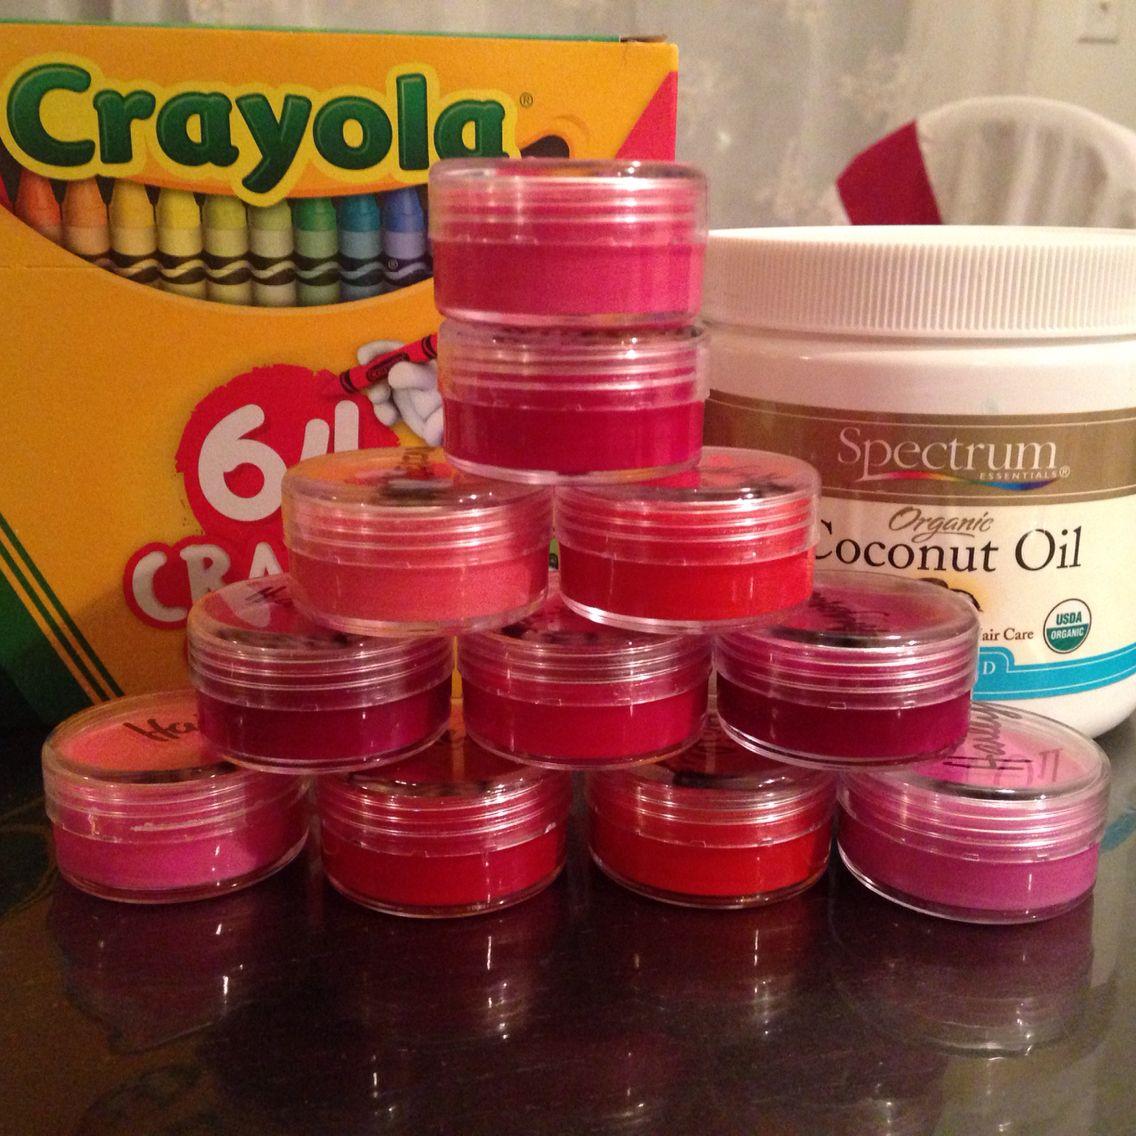 Diy lip balm organic coconut oil and crayons so easy